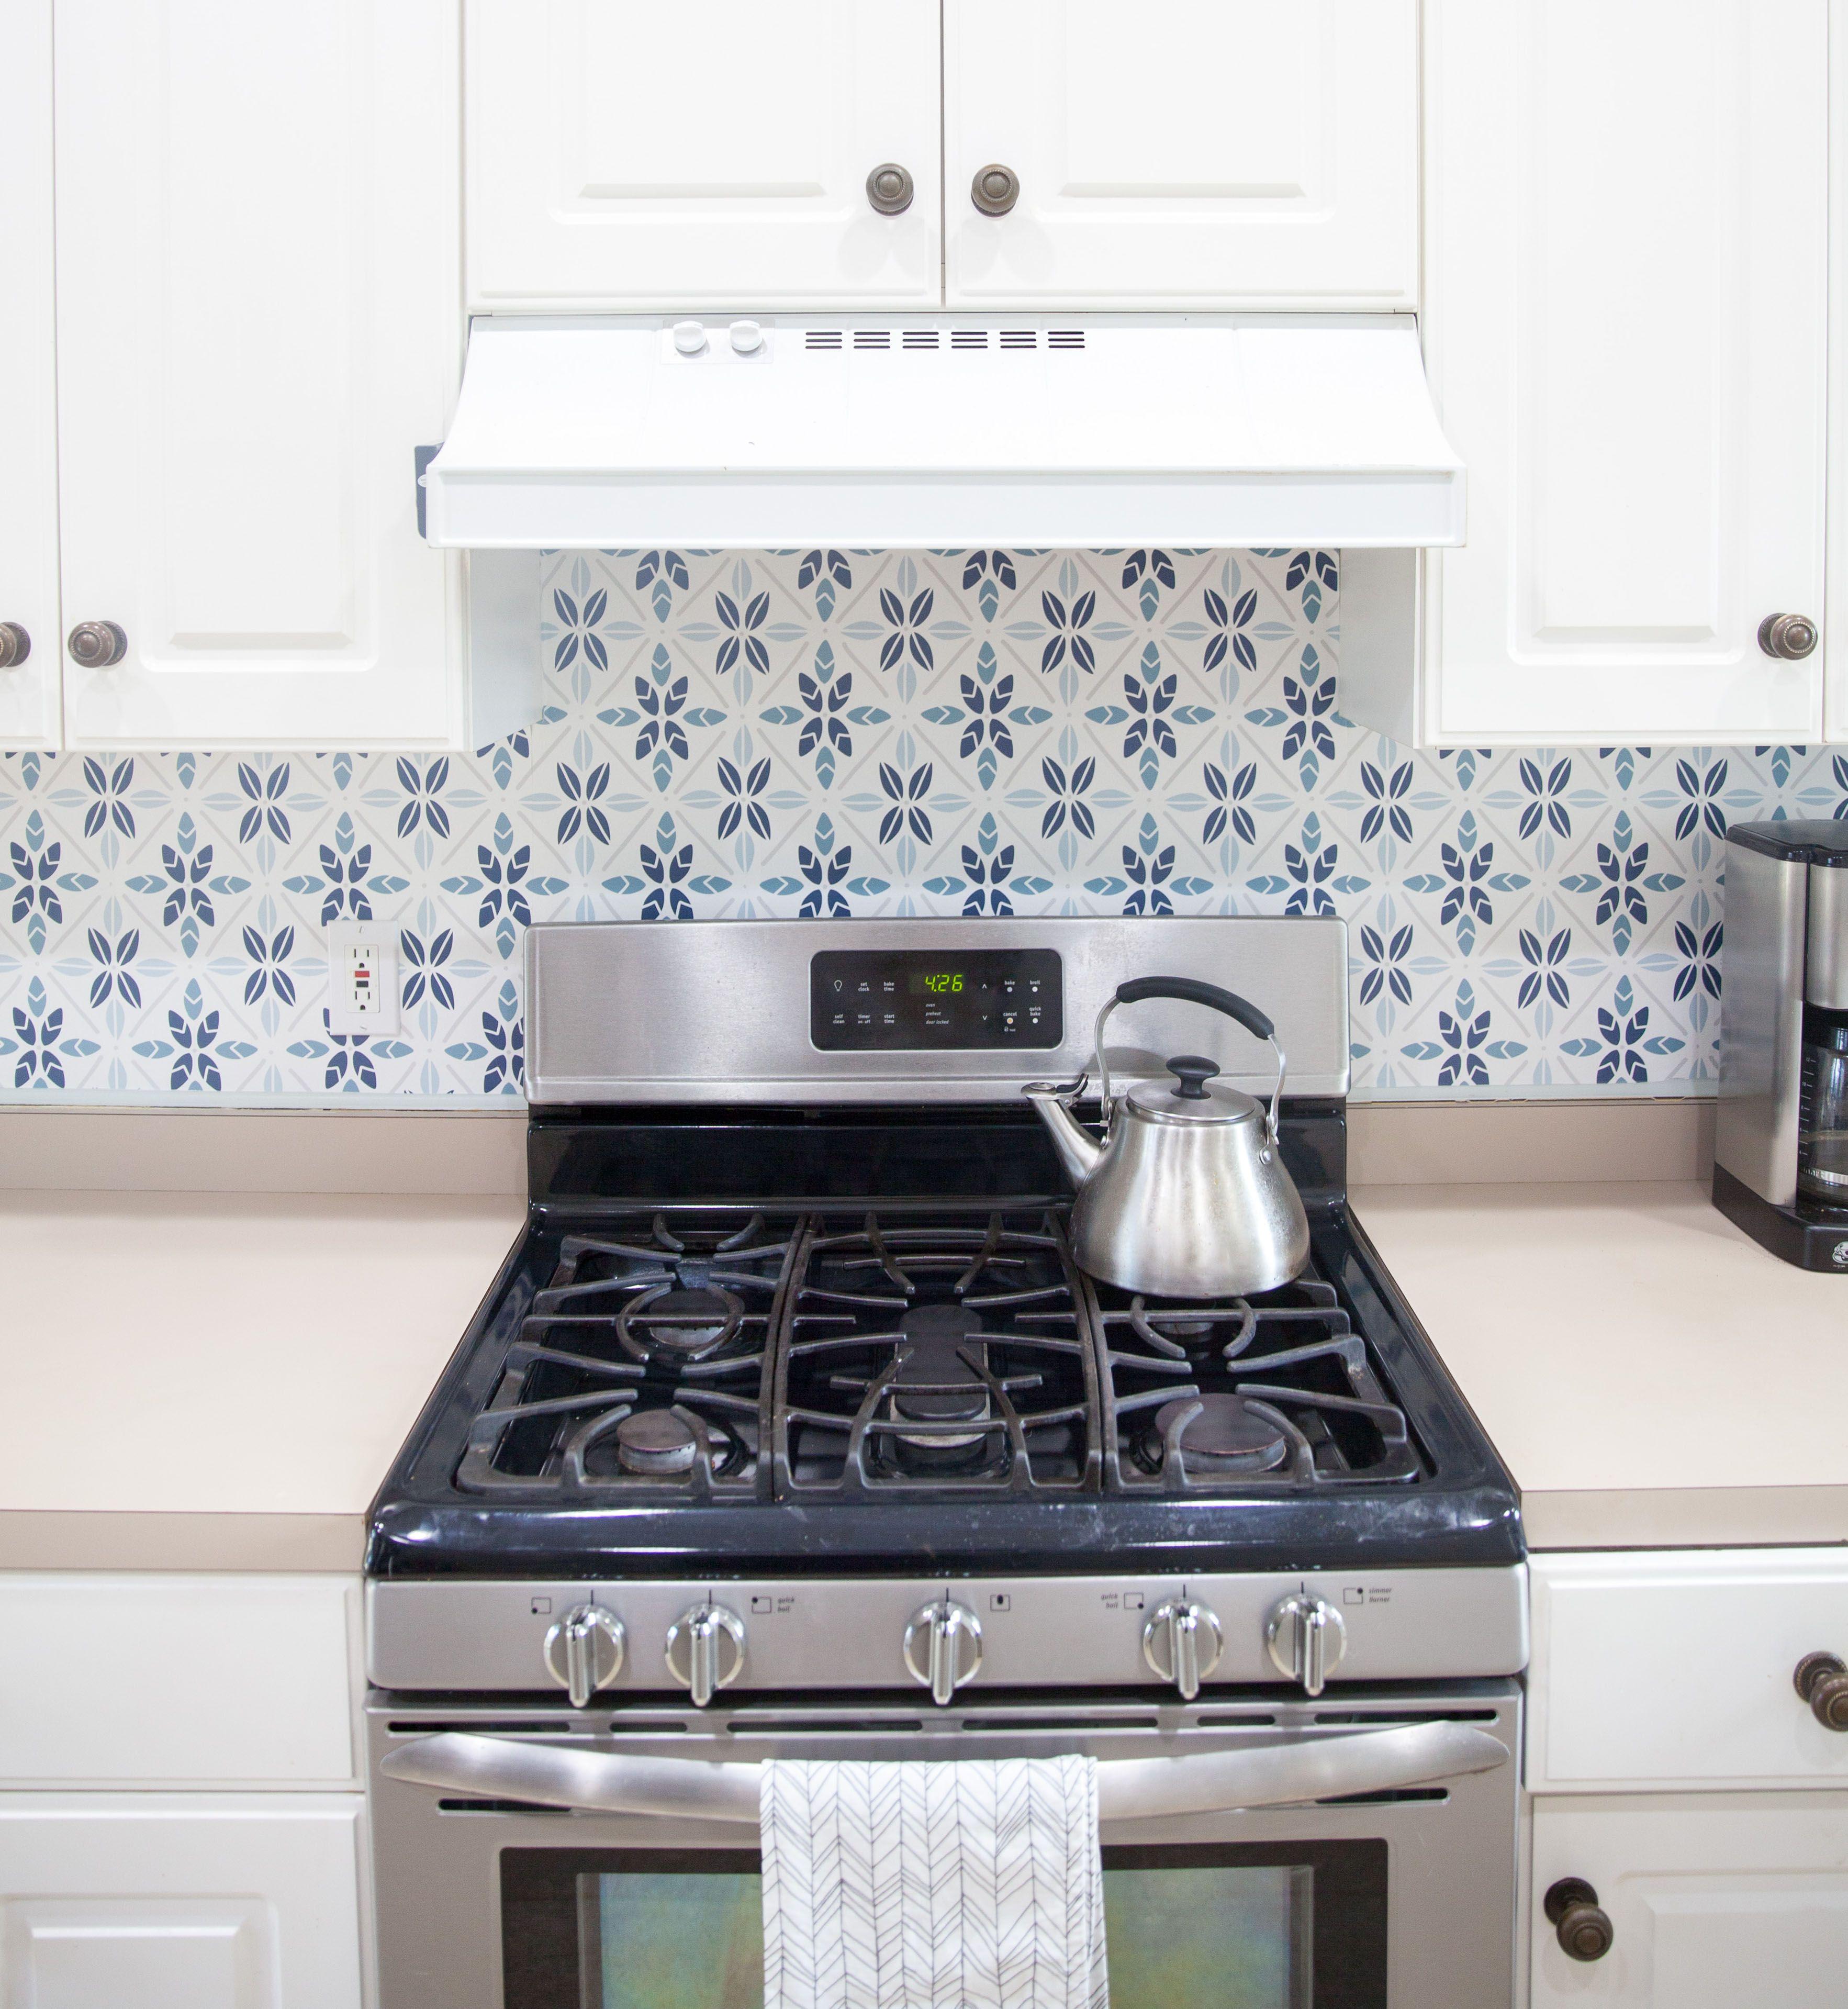 Easy Faux Tile Backsplash With Eco Friendly Wallpaper Diy Backsplash Backsplash Wallpaper Backsplash